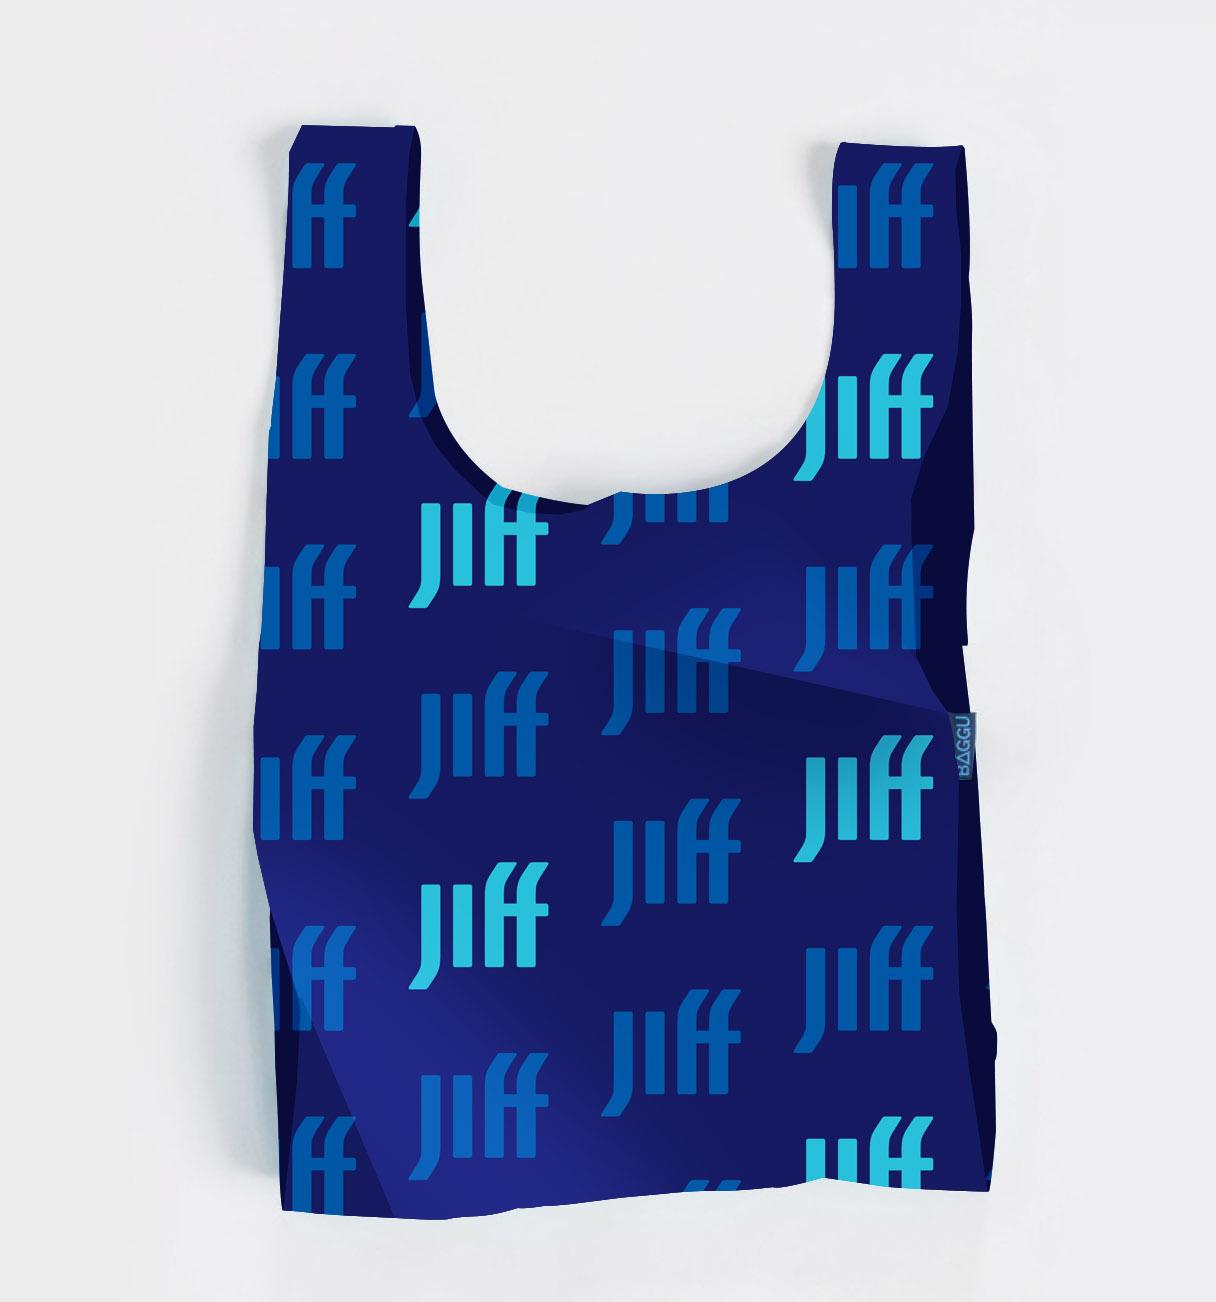 Jiff bag.jpg